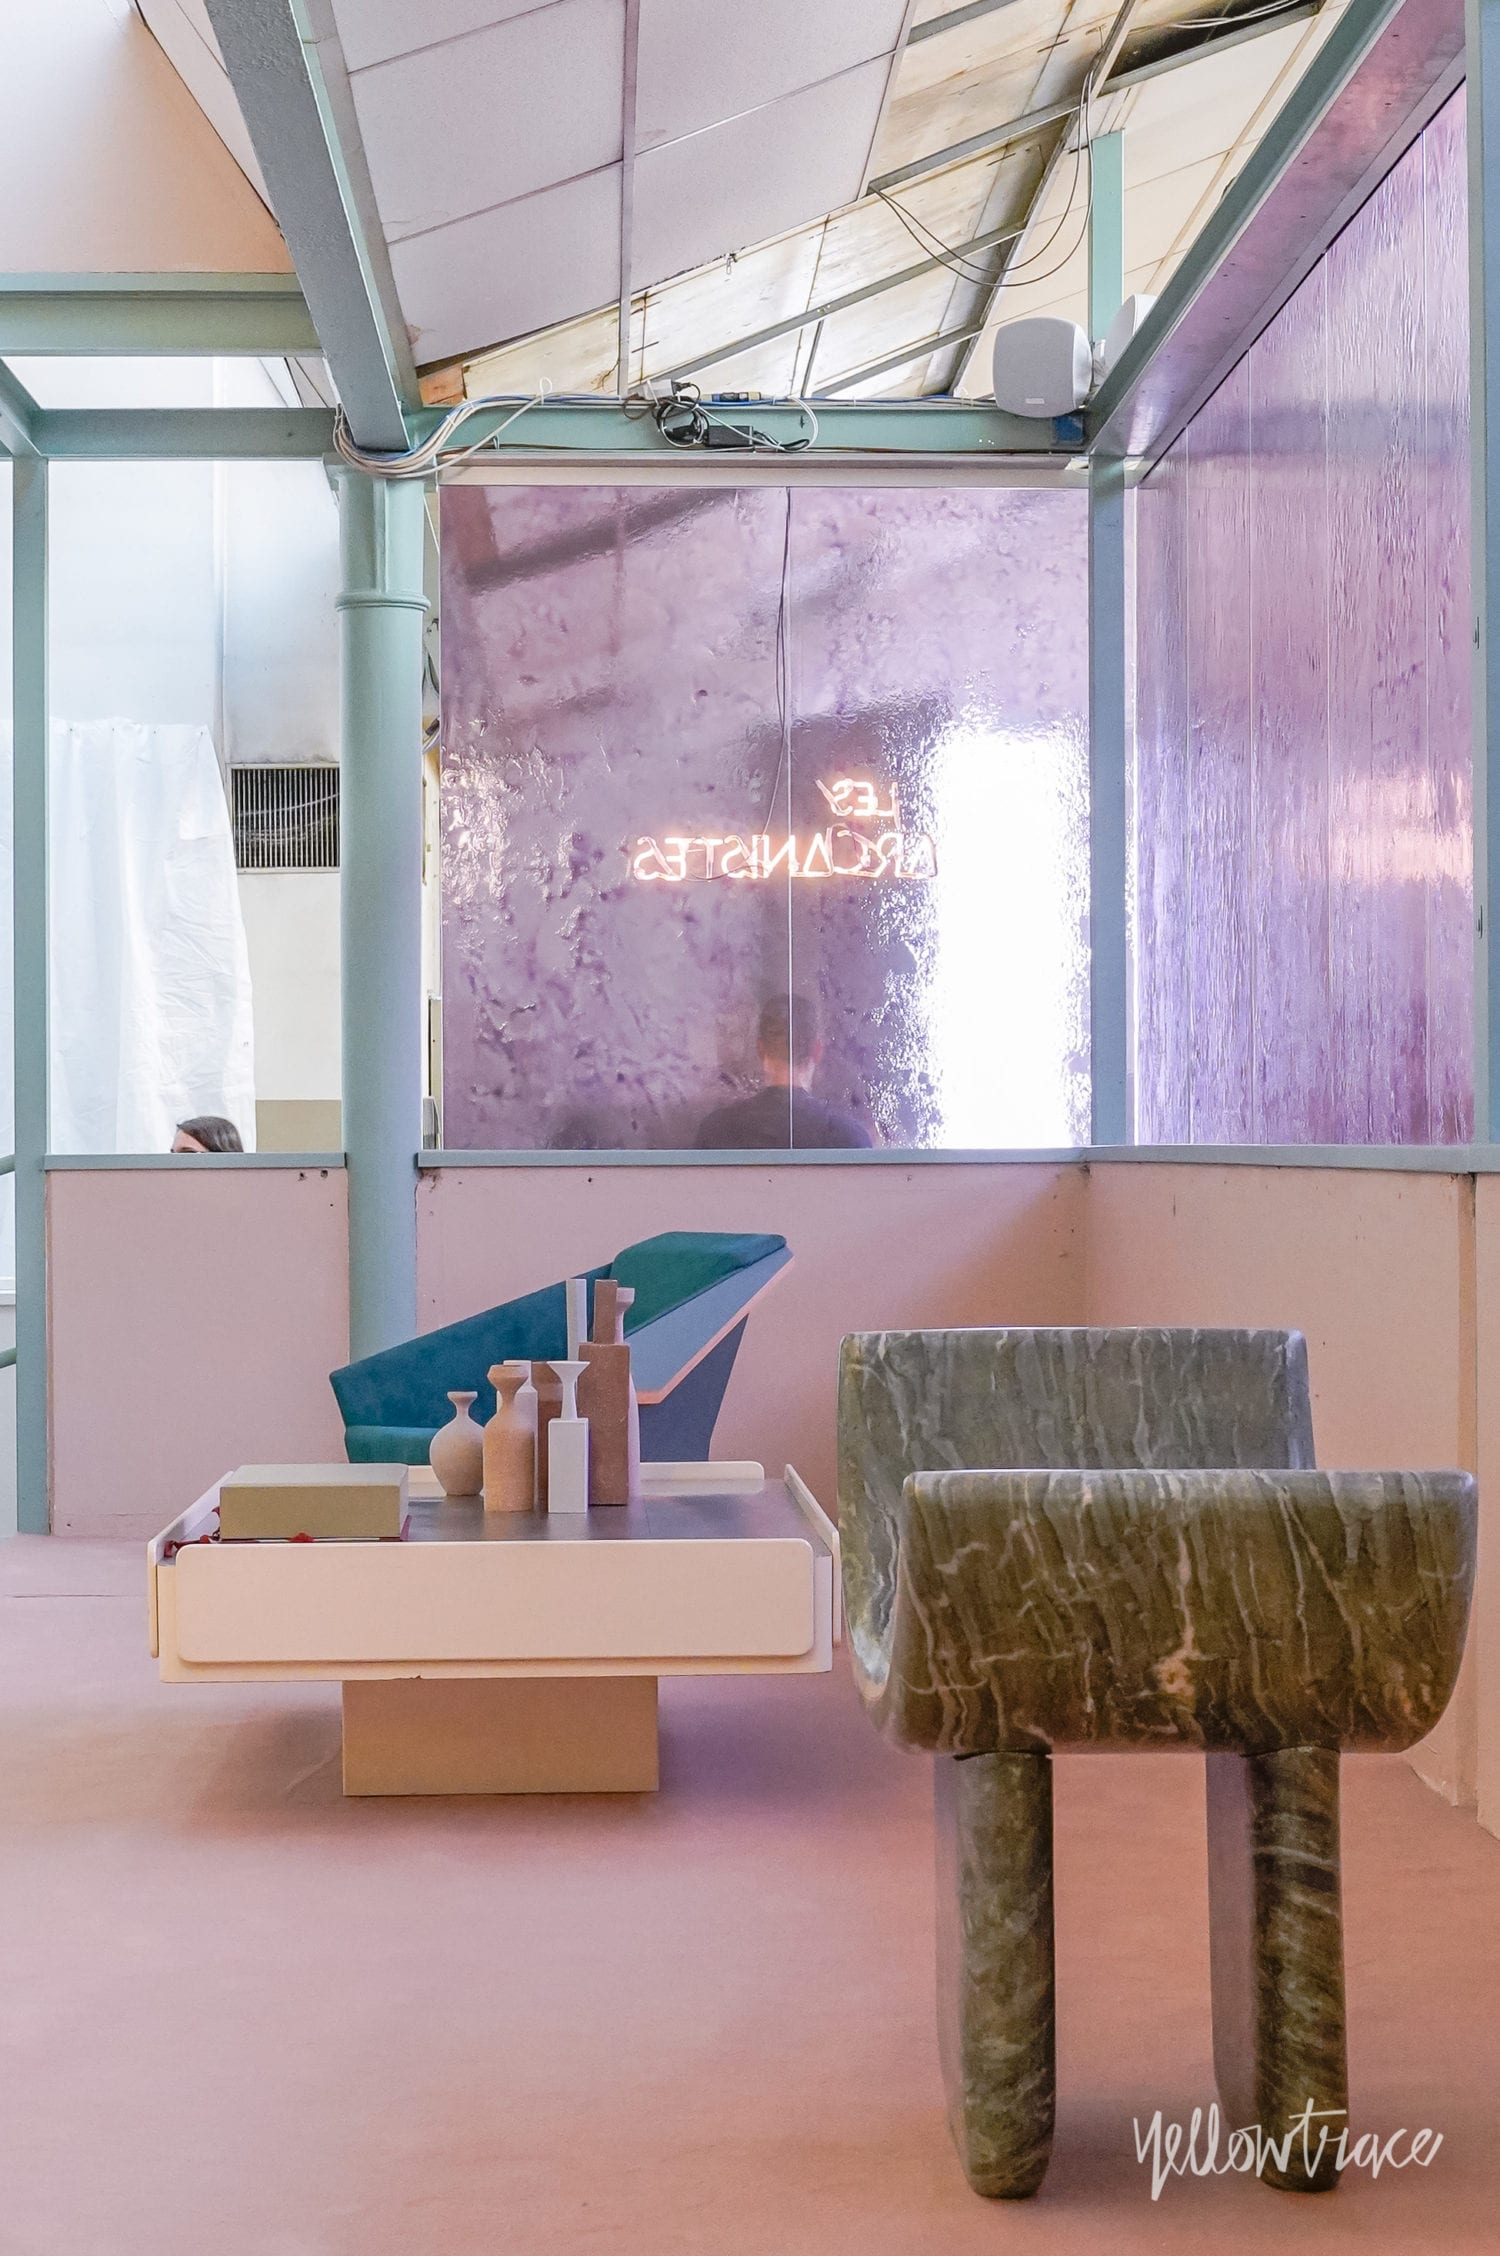 Les Arcanistes Studiopepe At Milan Design Week 2019 Photo Nick Hughes Yellowtrace 05